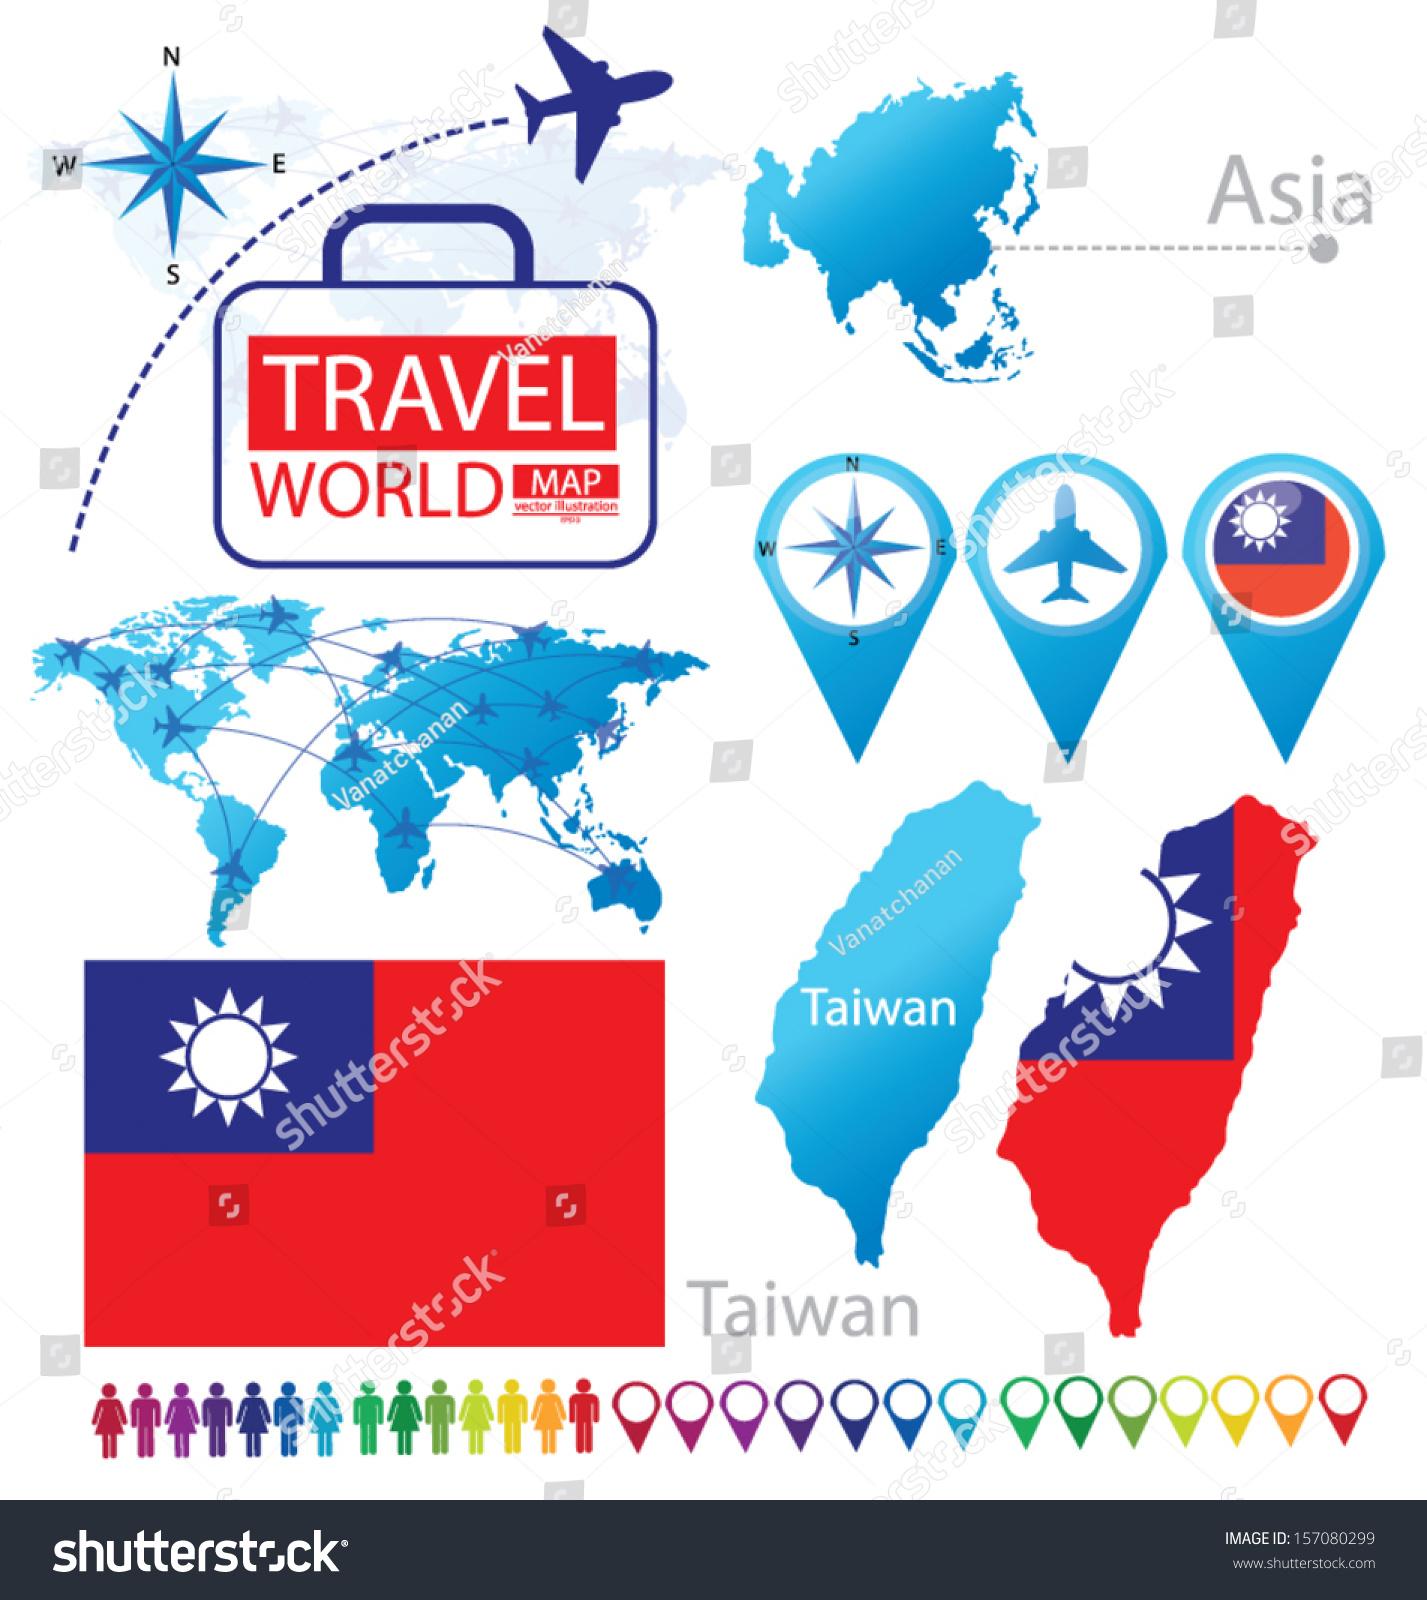 Asia Map Taiwan.Taiwan Flag Asia World Map Travel Stock Vector Royalty Free